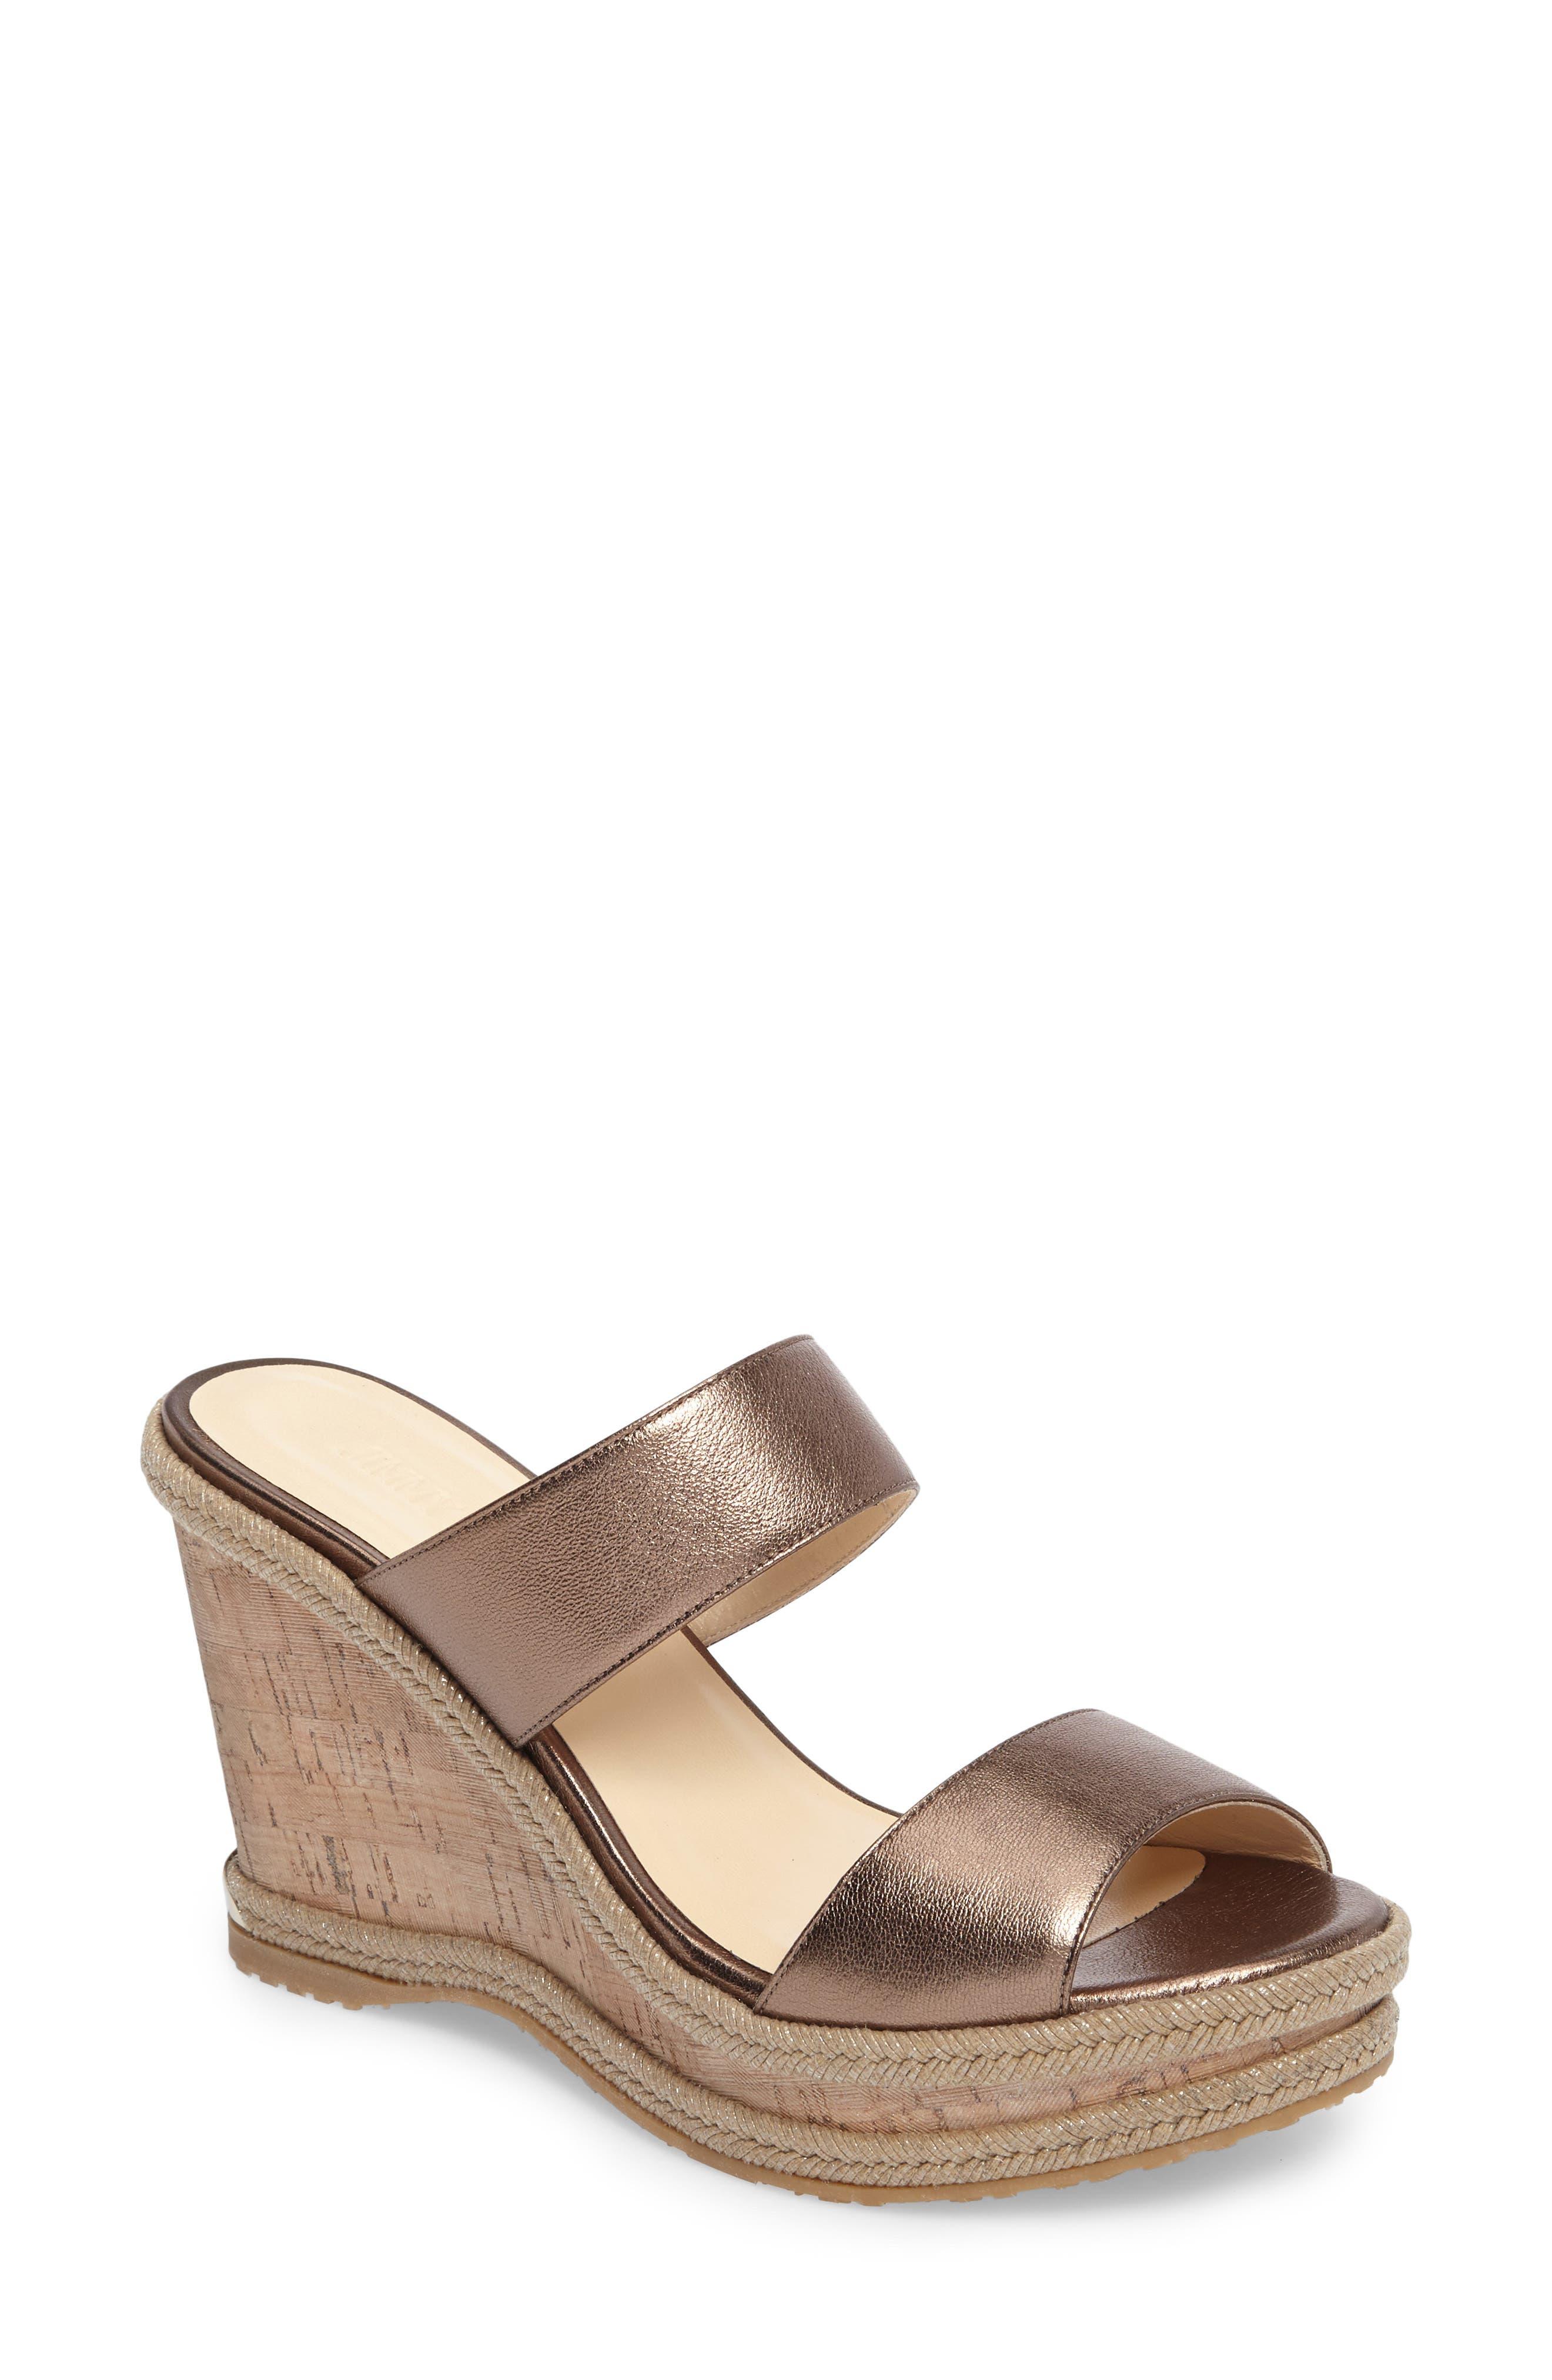 Parker Wedge Sandal,                         Main,                         color, 710